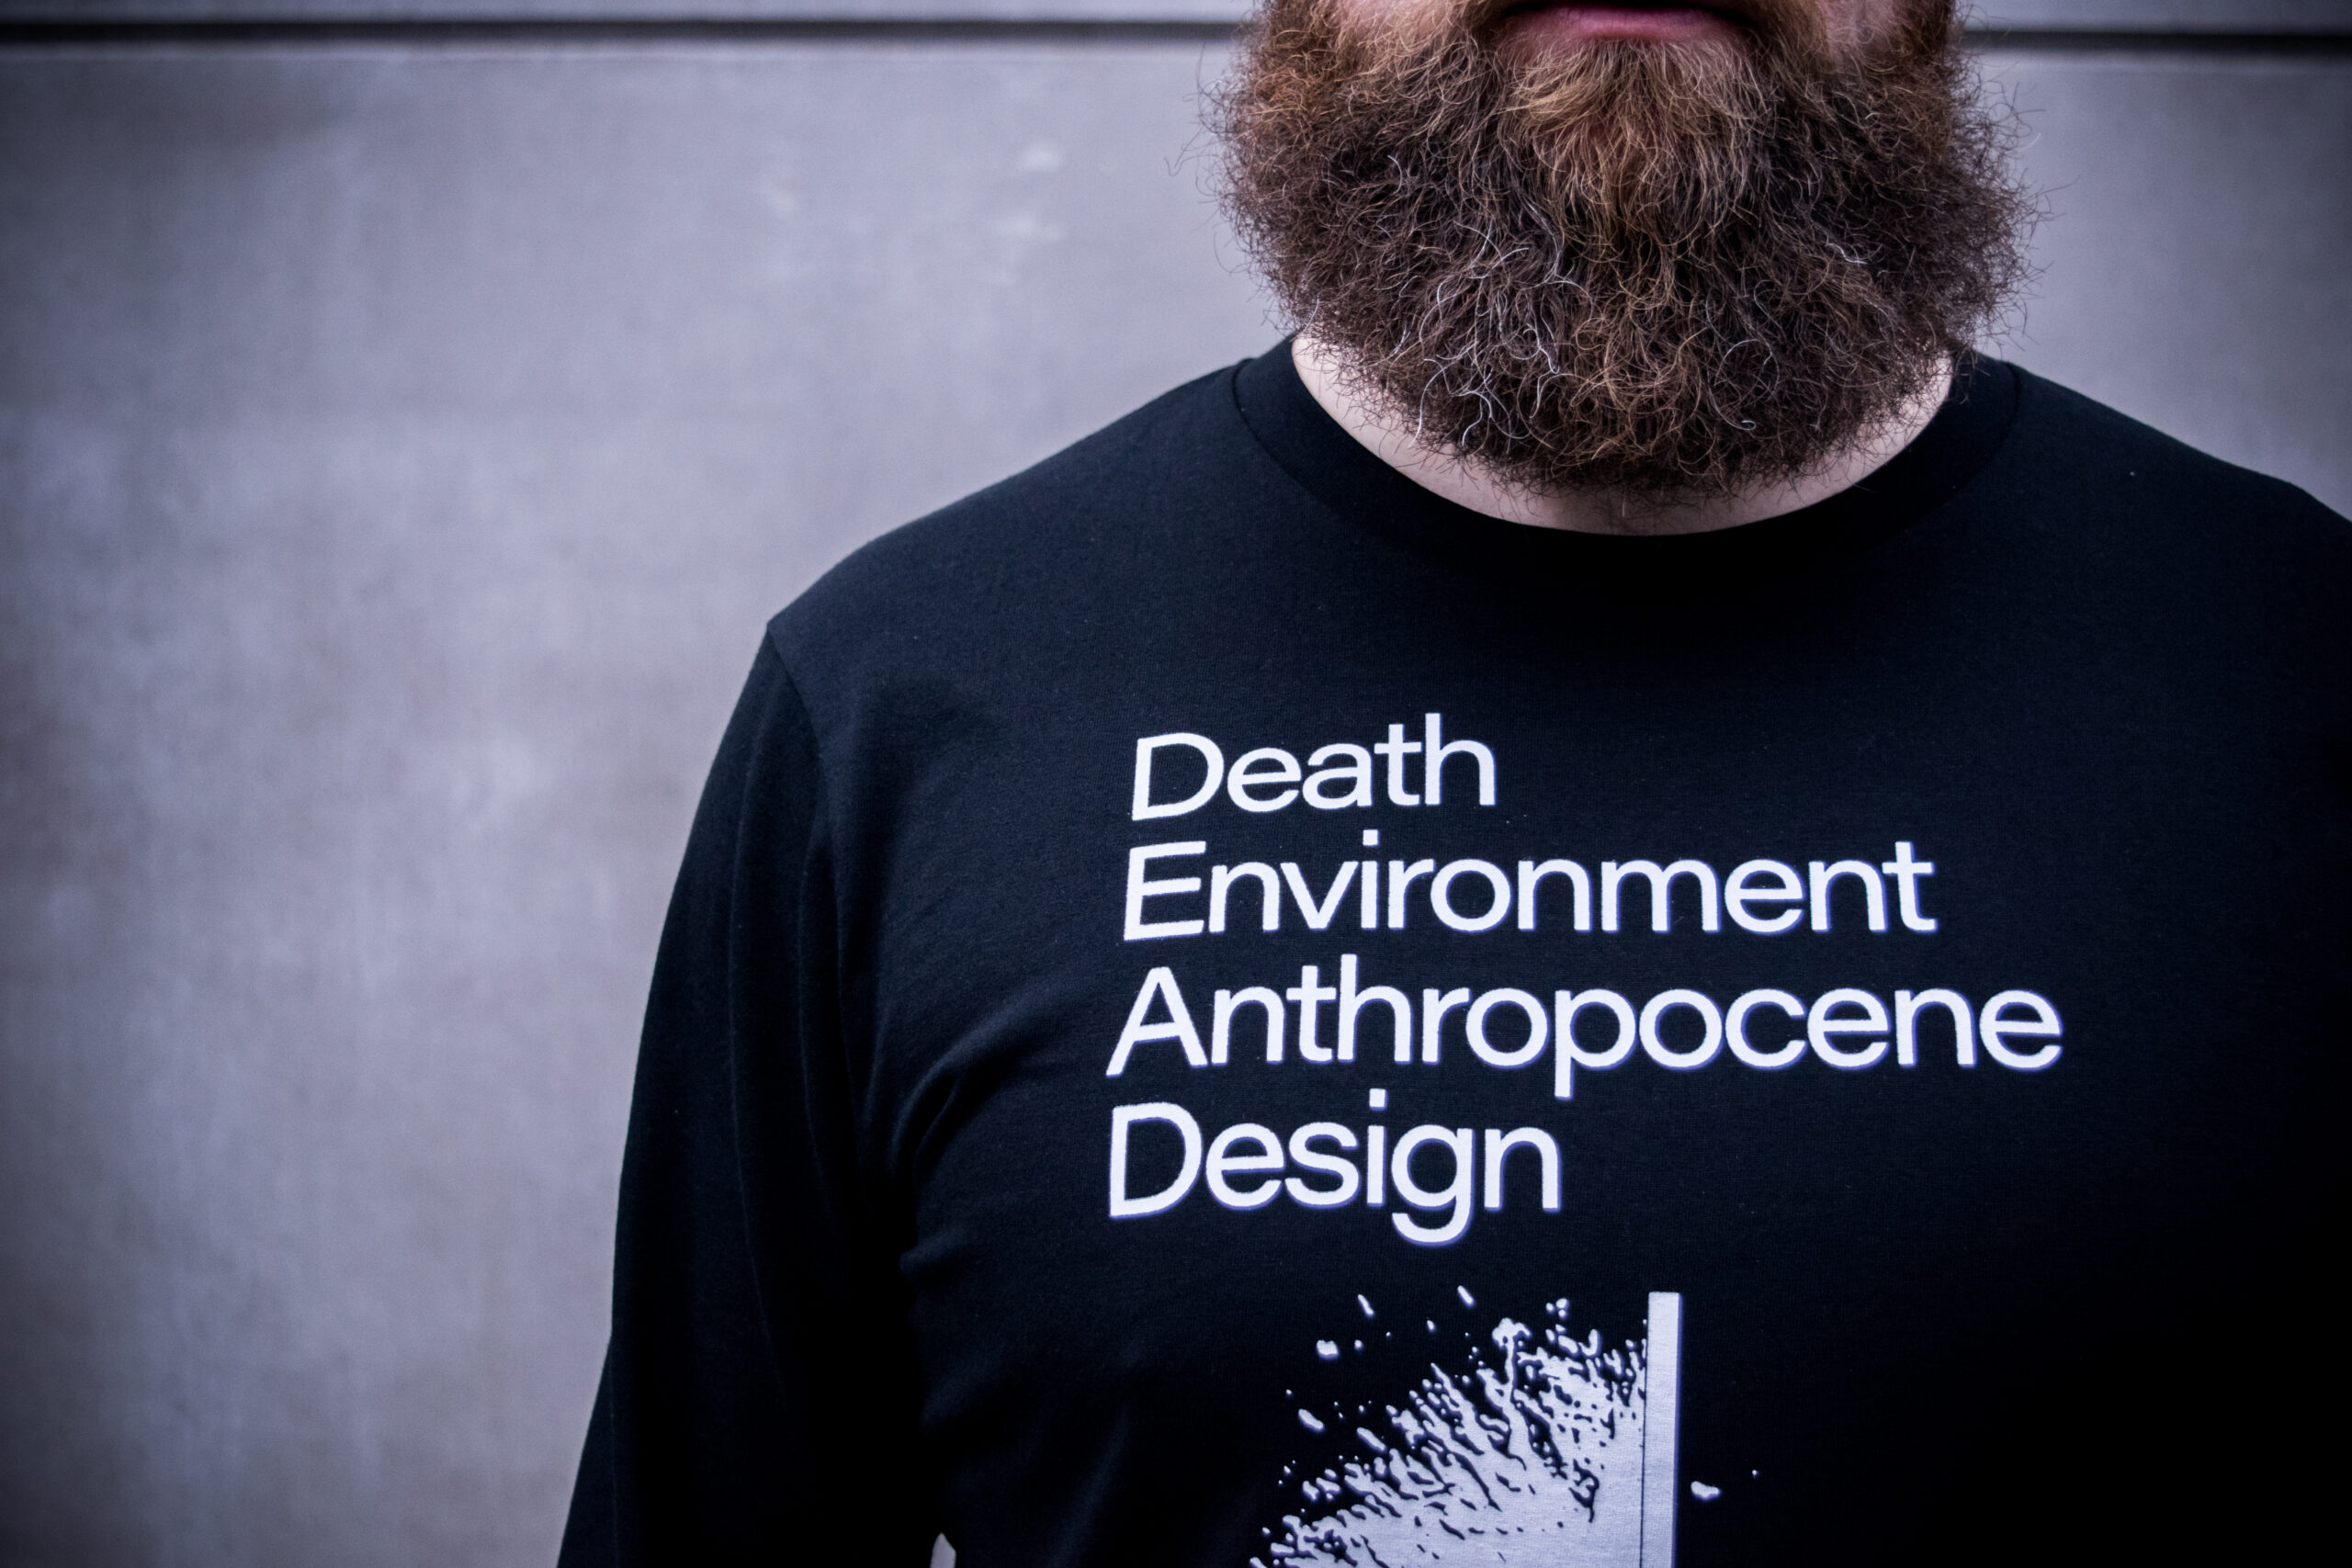 Okjökul Memorial Shirt (Memorial Shirts for Nonhuman Entities I)